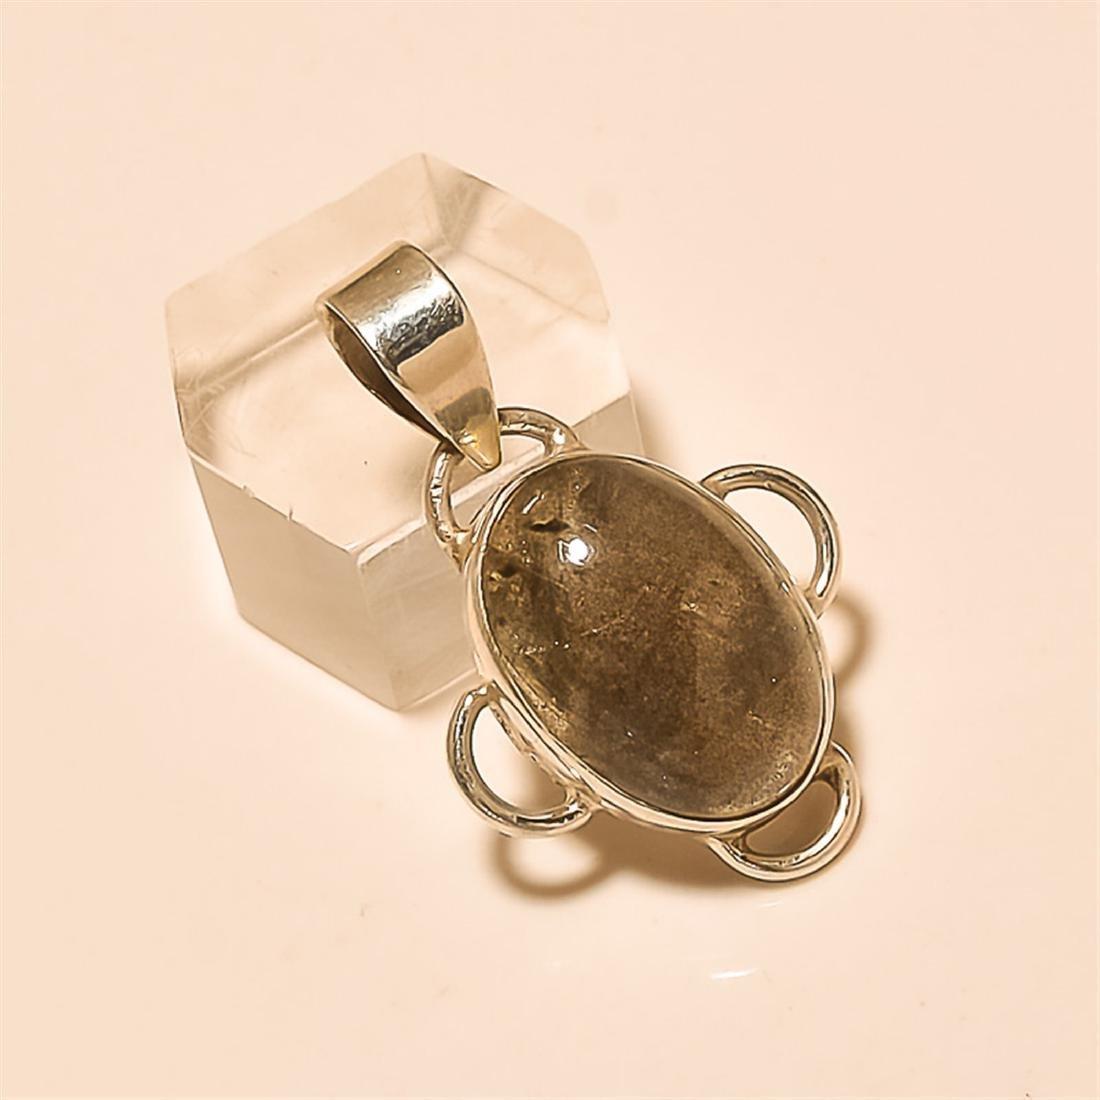 Labradorite Pendant Solid Sterling Silver